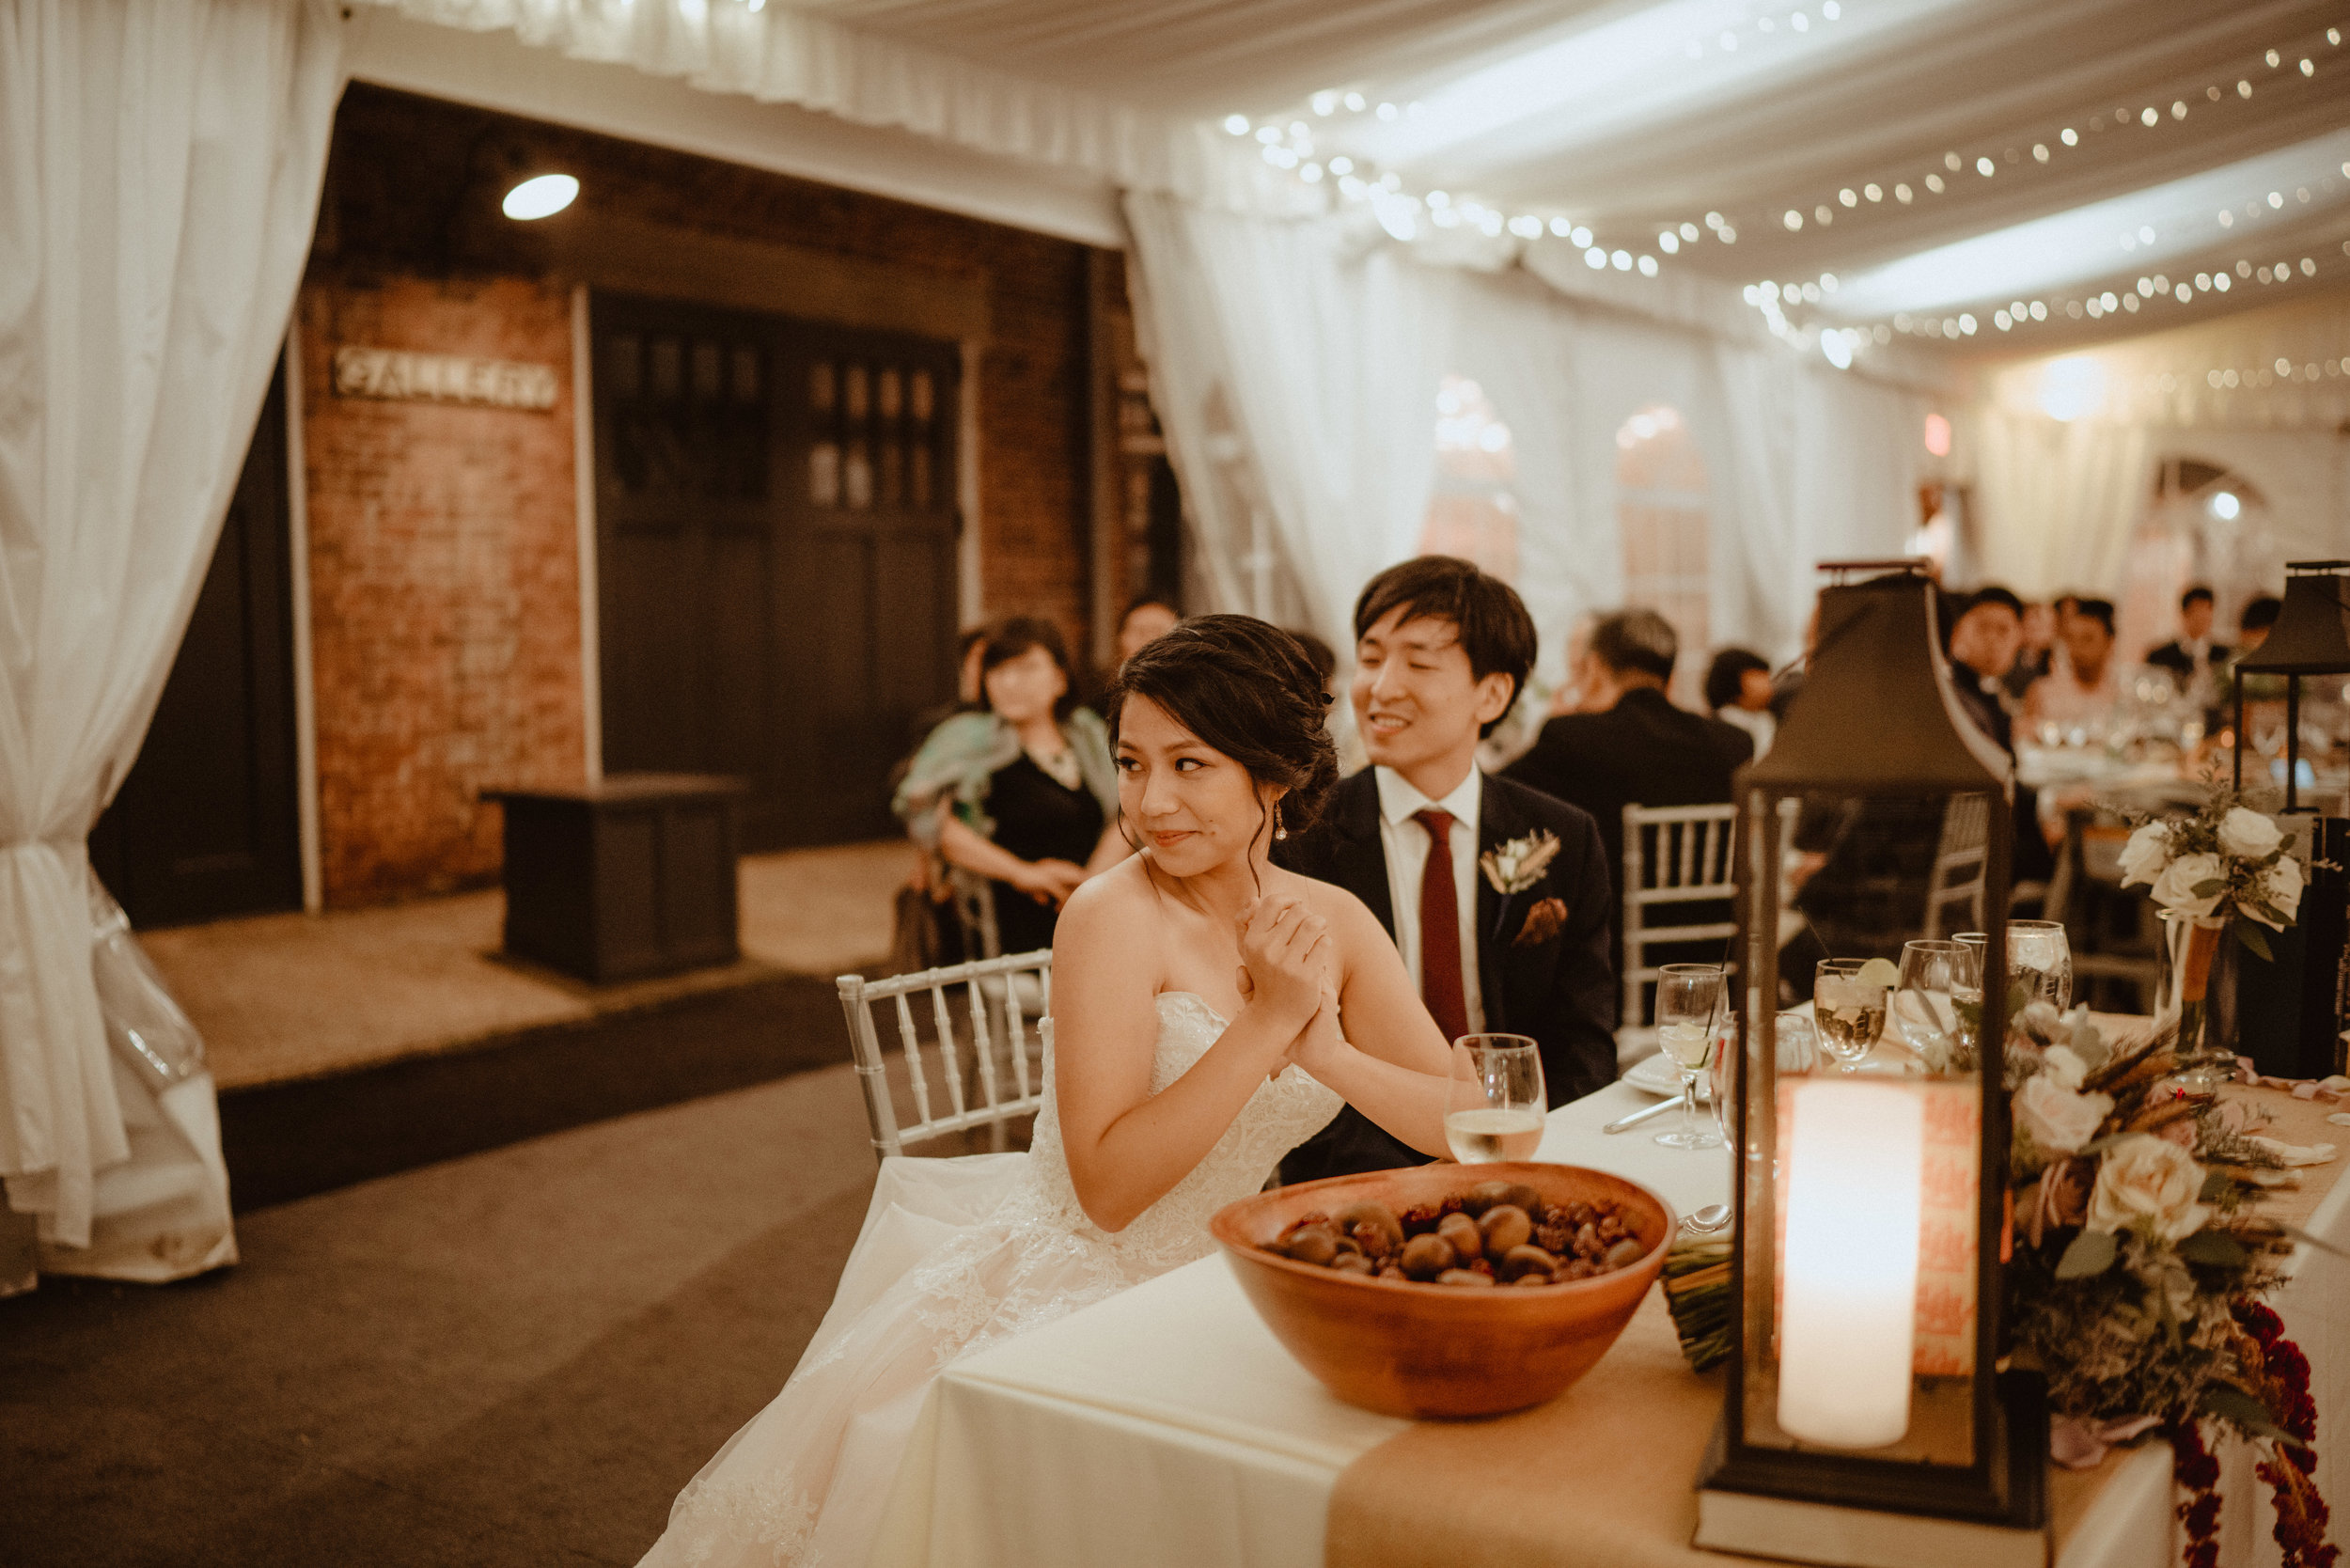 Irene-and-Jae-2019_Brooklyn_Wedding_Photographer_Chellise_Michael_Photography--116.jpg